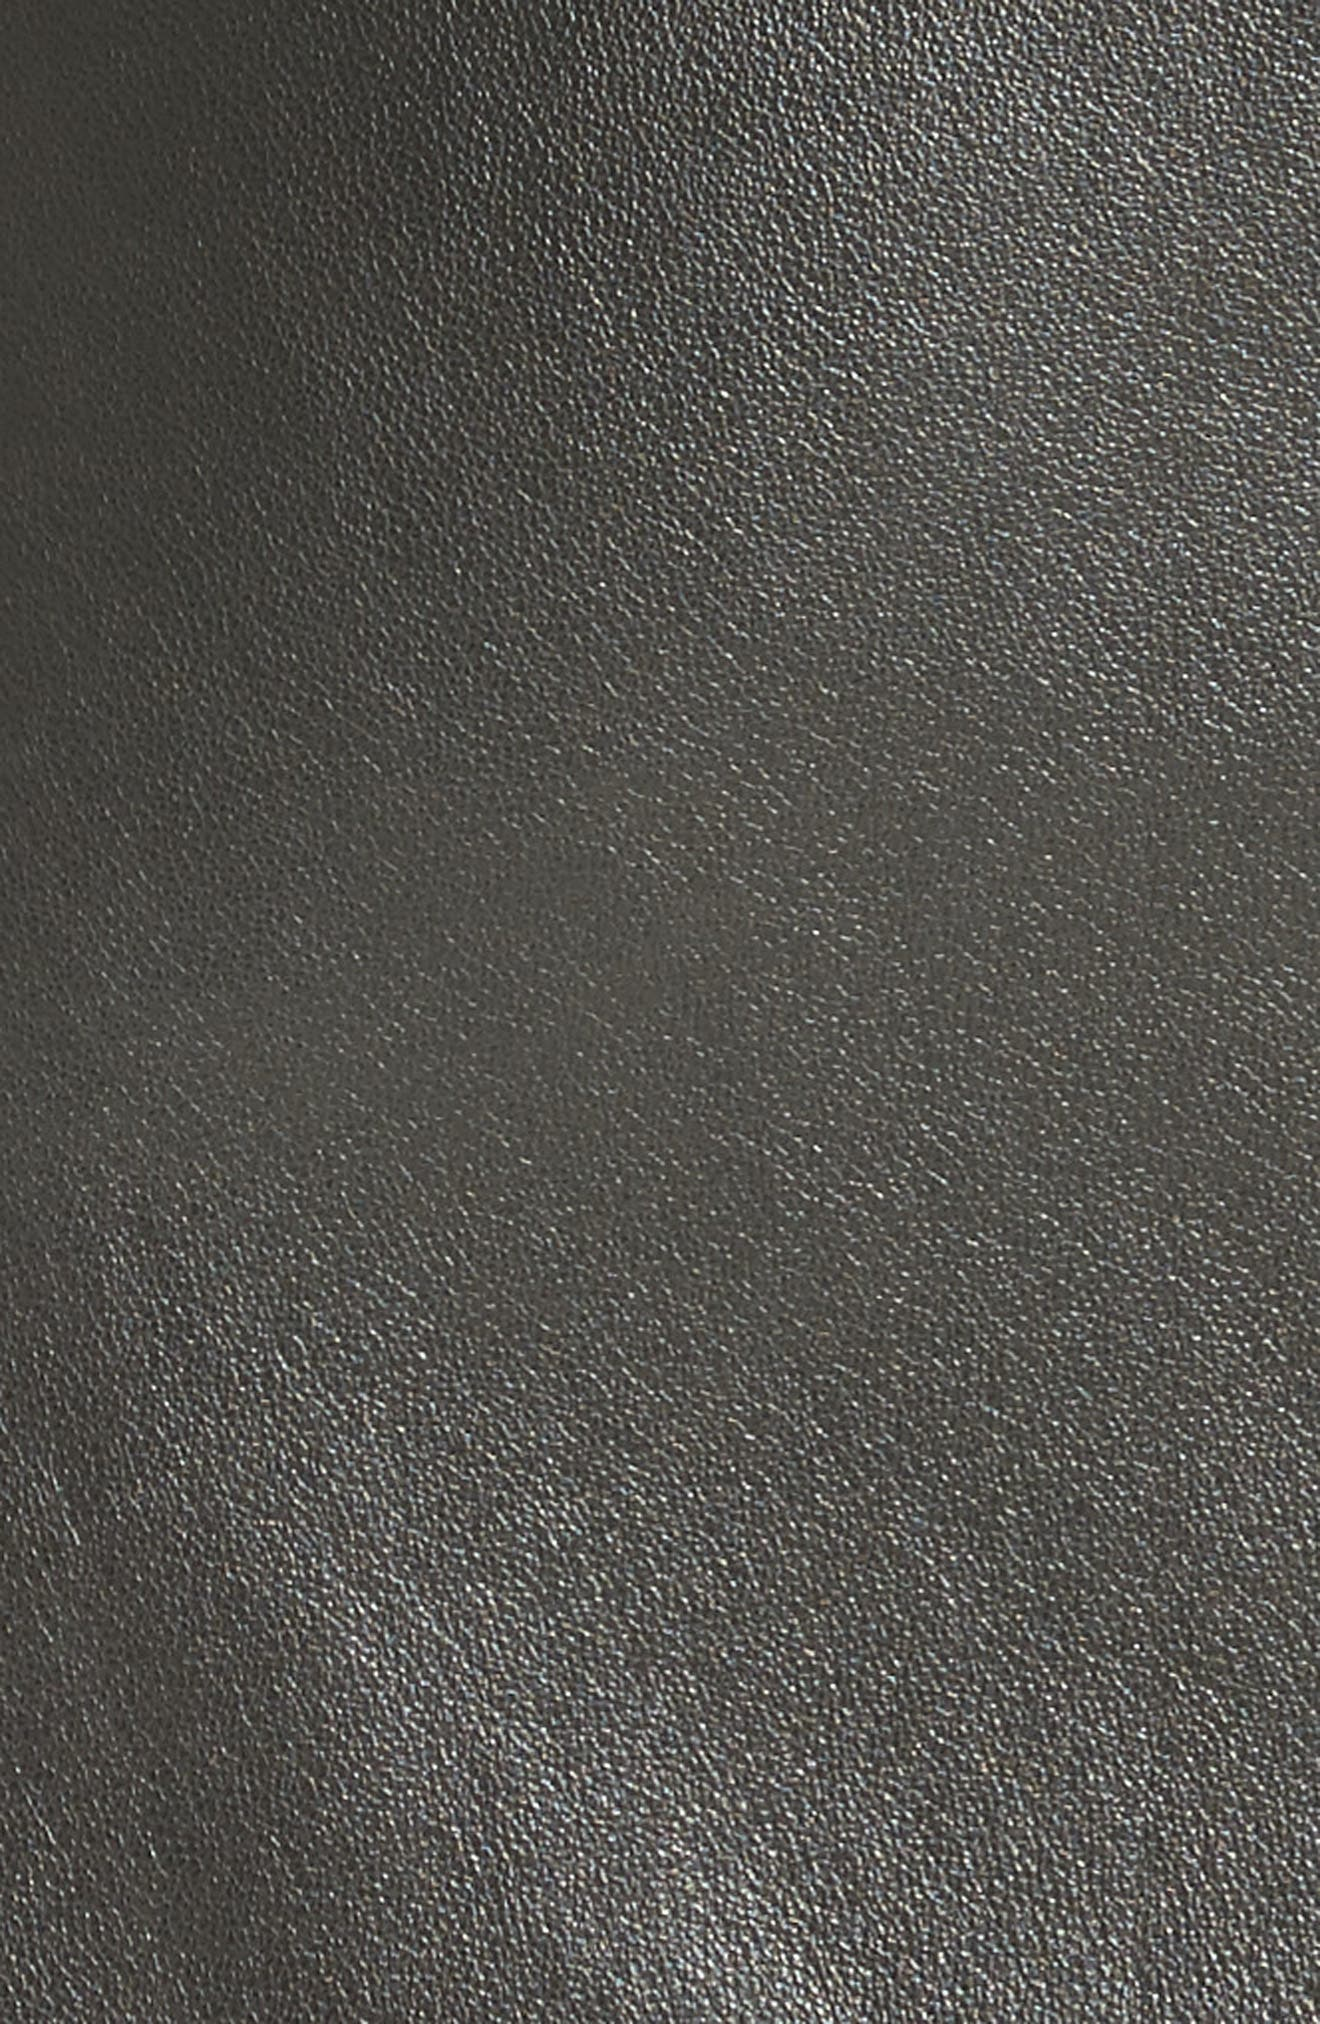 Alternate Image 2  - Alexander Wang Snap Leather Miniskirt